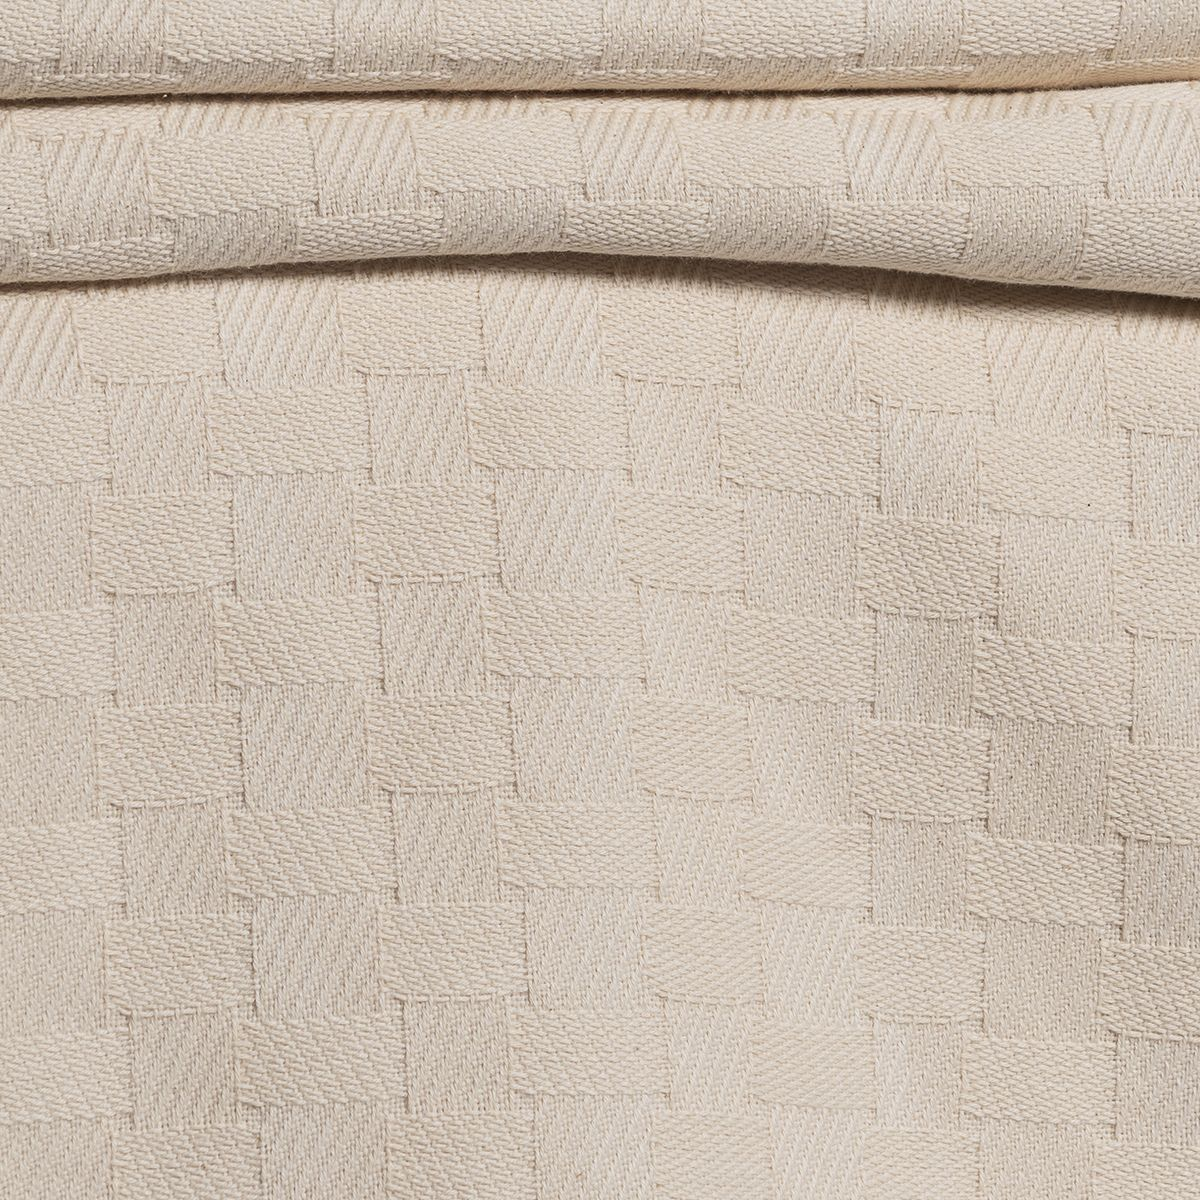 Throw Sugar Fabric - Patchwork / Black Stitched